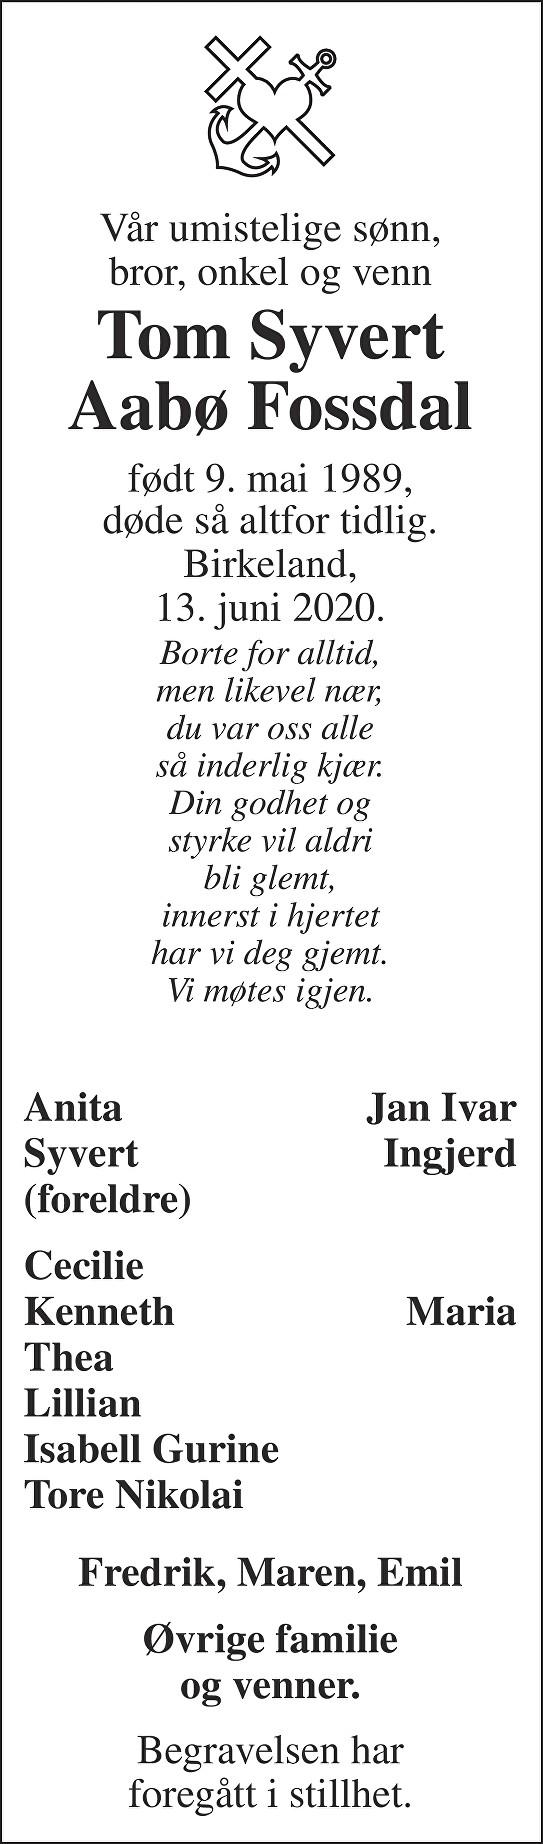 Tom Syvert Aabø Fossdal Dødsannonse